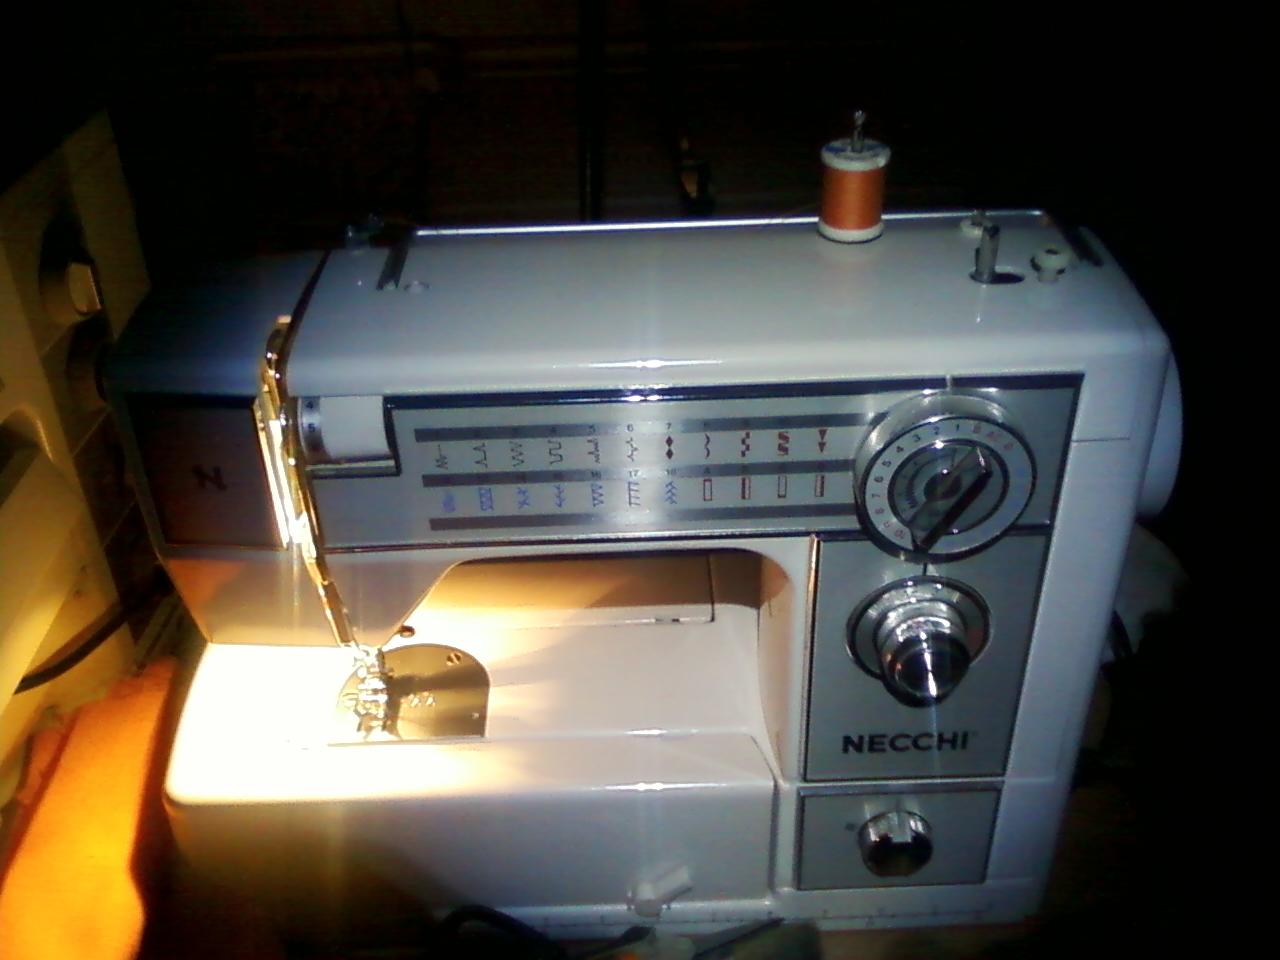 Necchi Sewing Machine Manual 575fa One Word Quickstart Guide Book Bu Threading Diagram Vintage Machines 575 Fa Great For Rh Tumorfarmer Blogspot Com Information